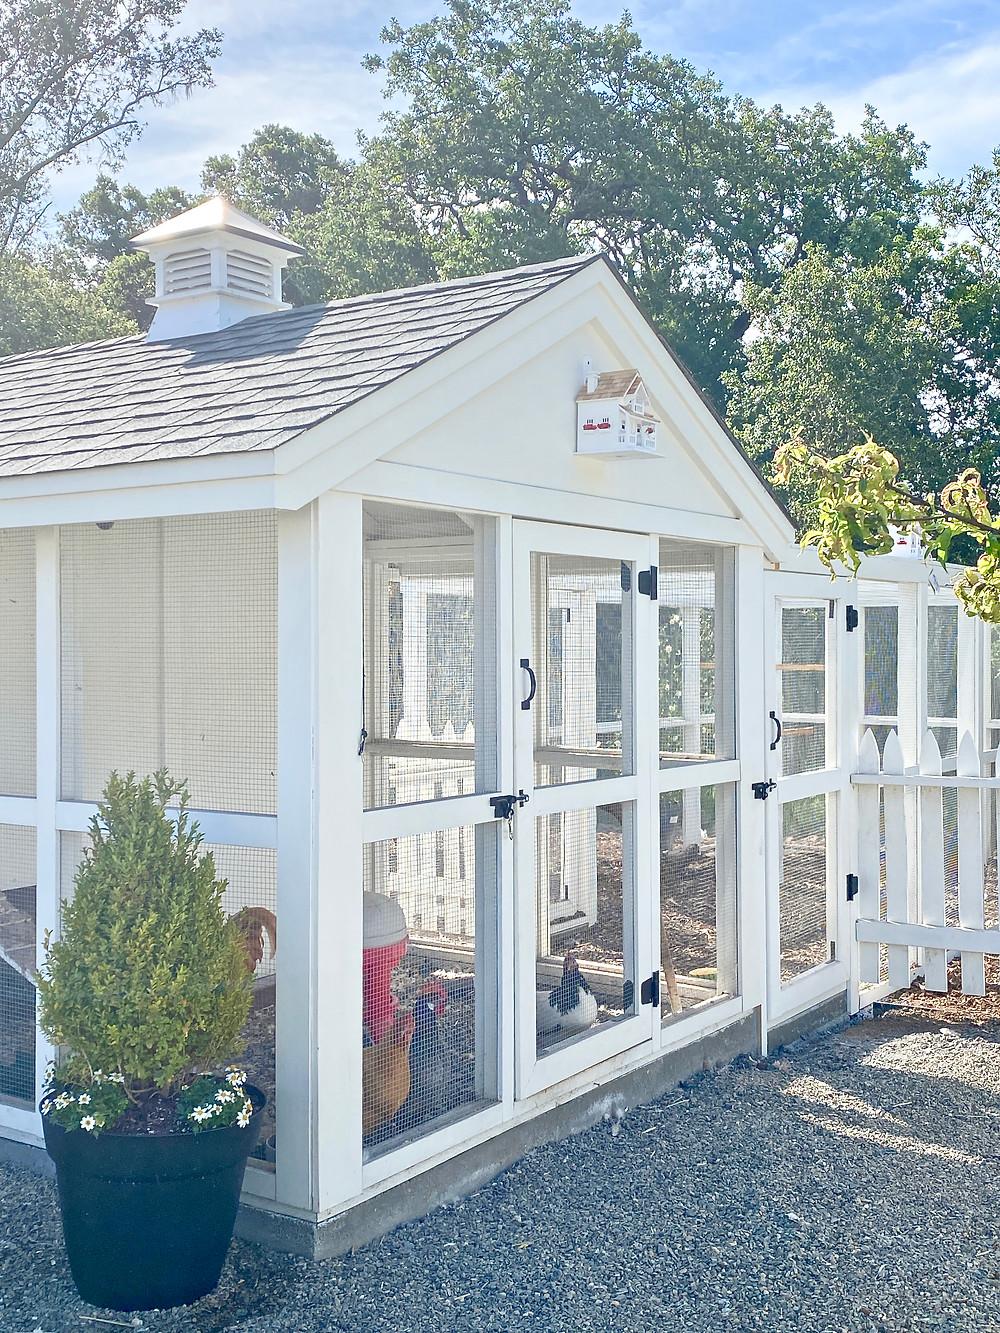 Charming chicken coop design at Rock Haven Farm, backyard chicken coop, chicken coops..